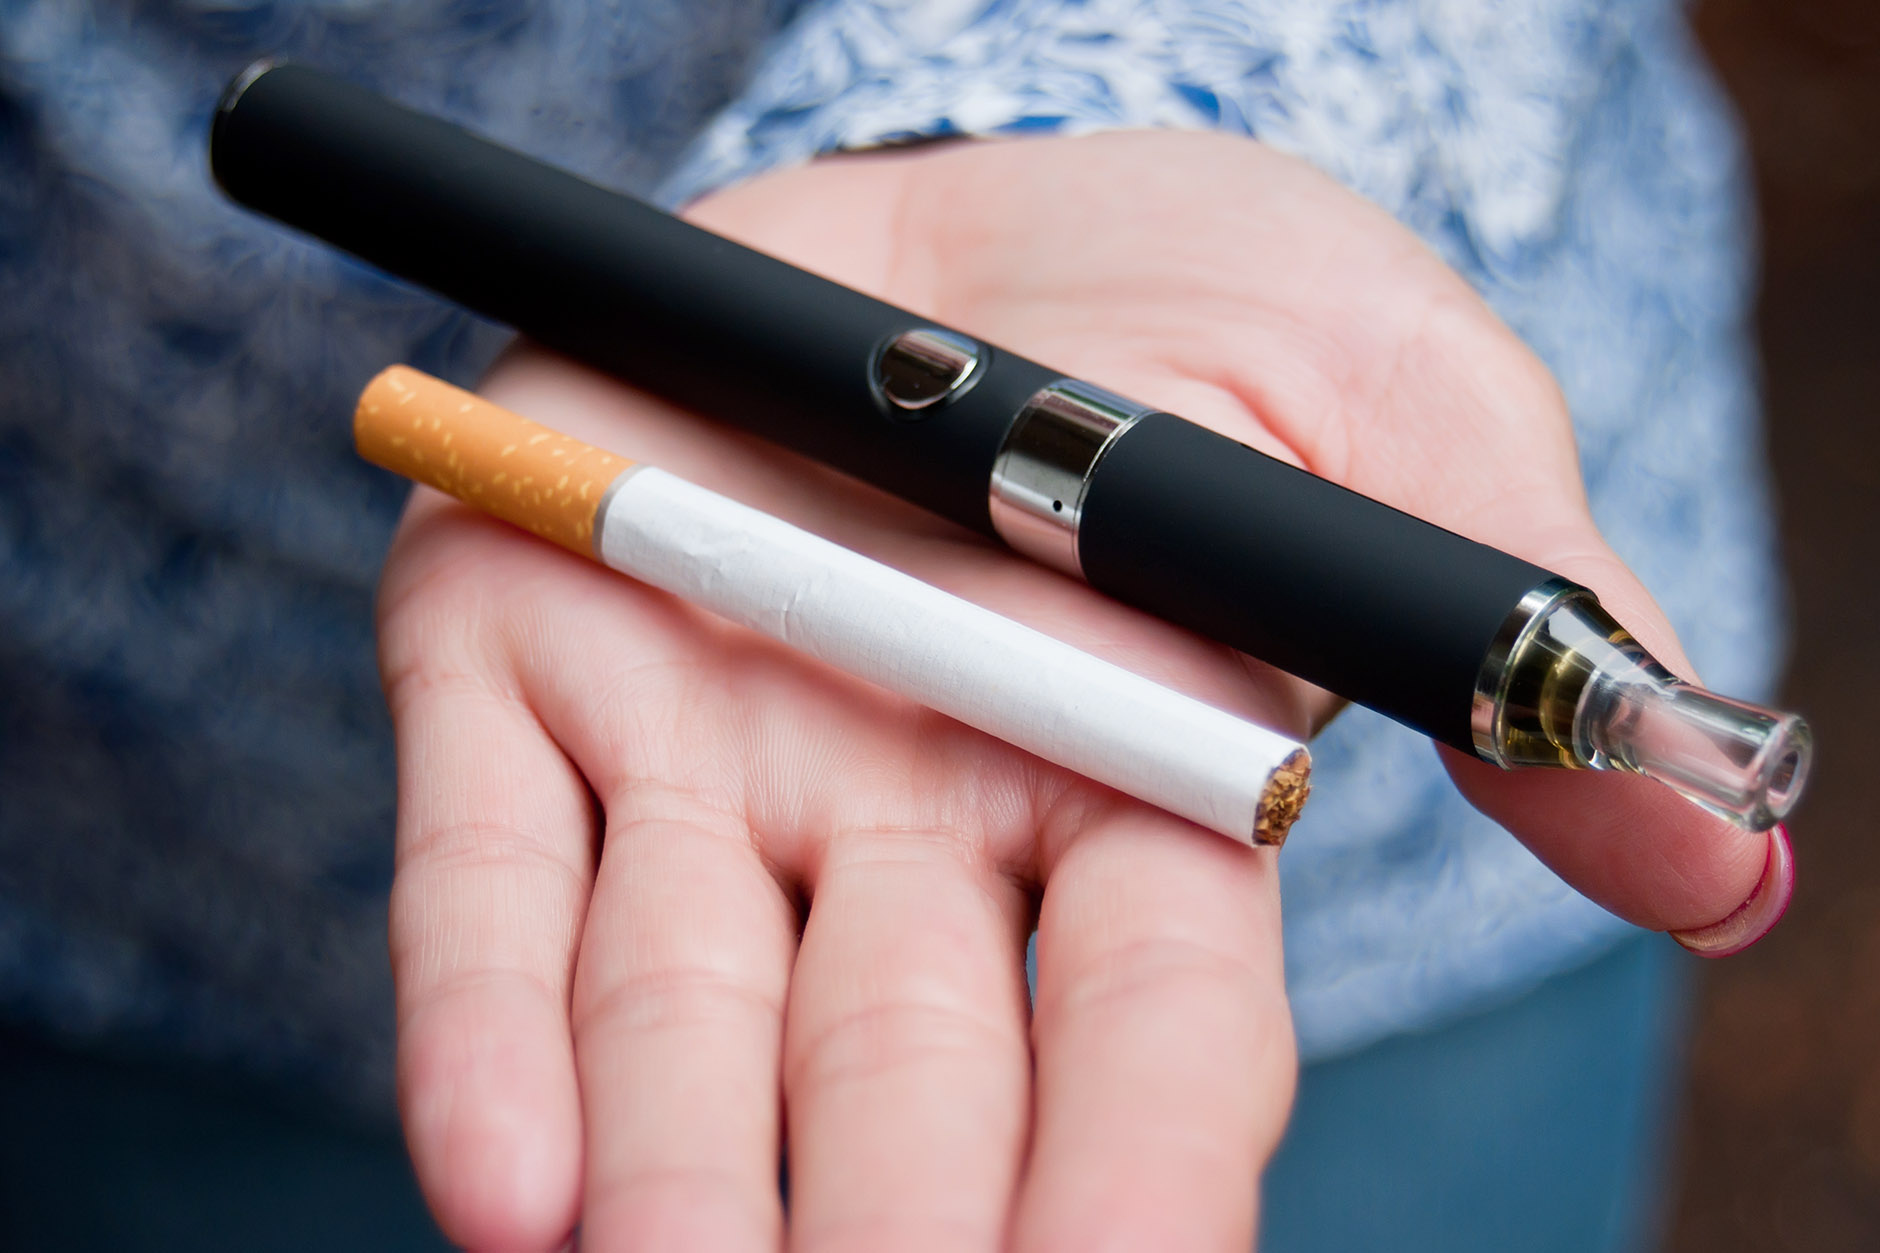 The era of electronic cigarettes